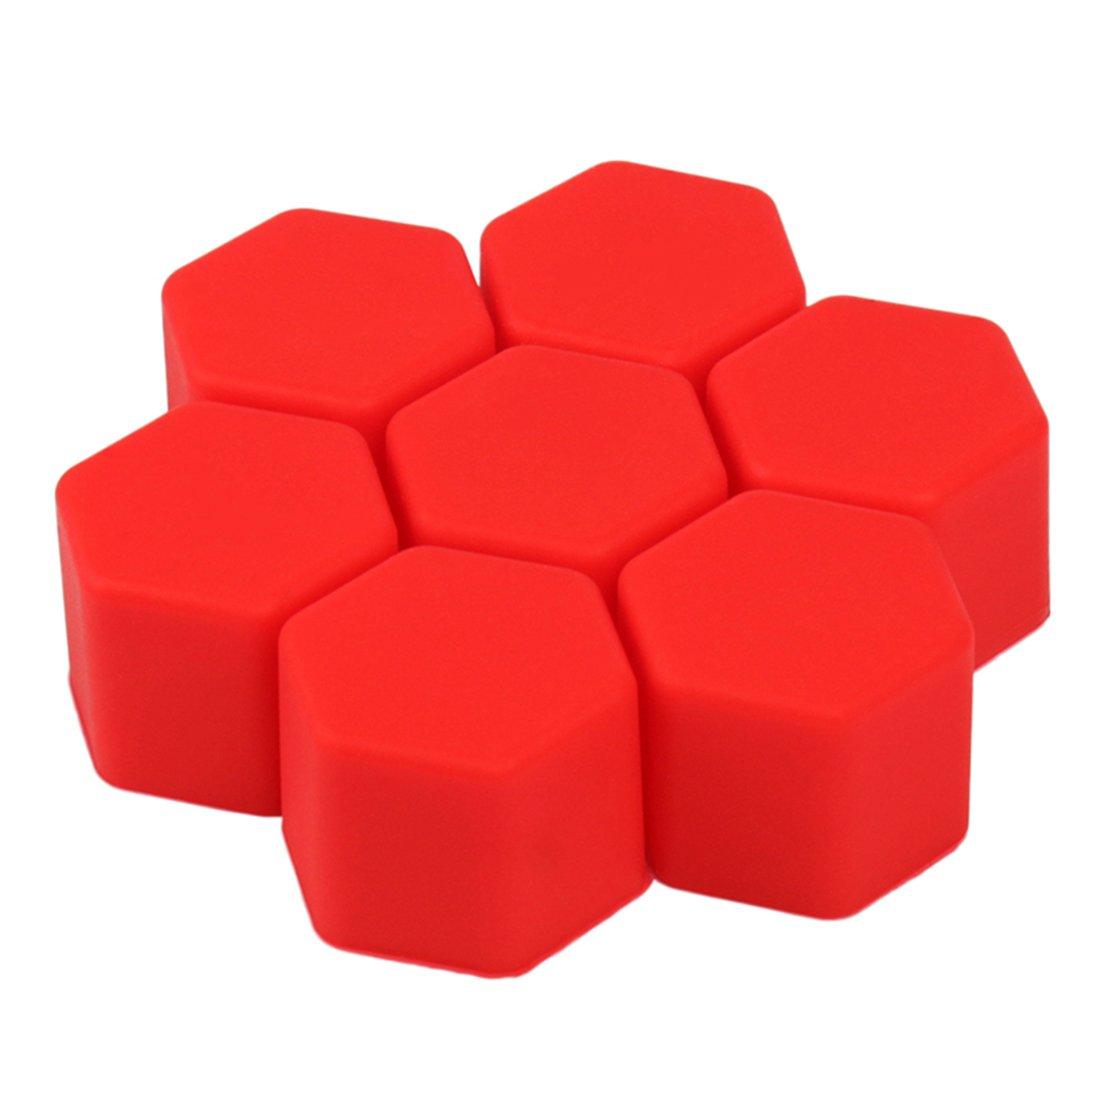 Andux Zone Wheel Lug Nut Covers 21mm 20PCS LSBHT-01 Red